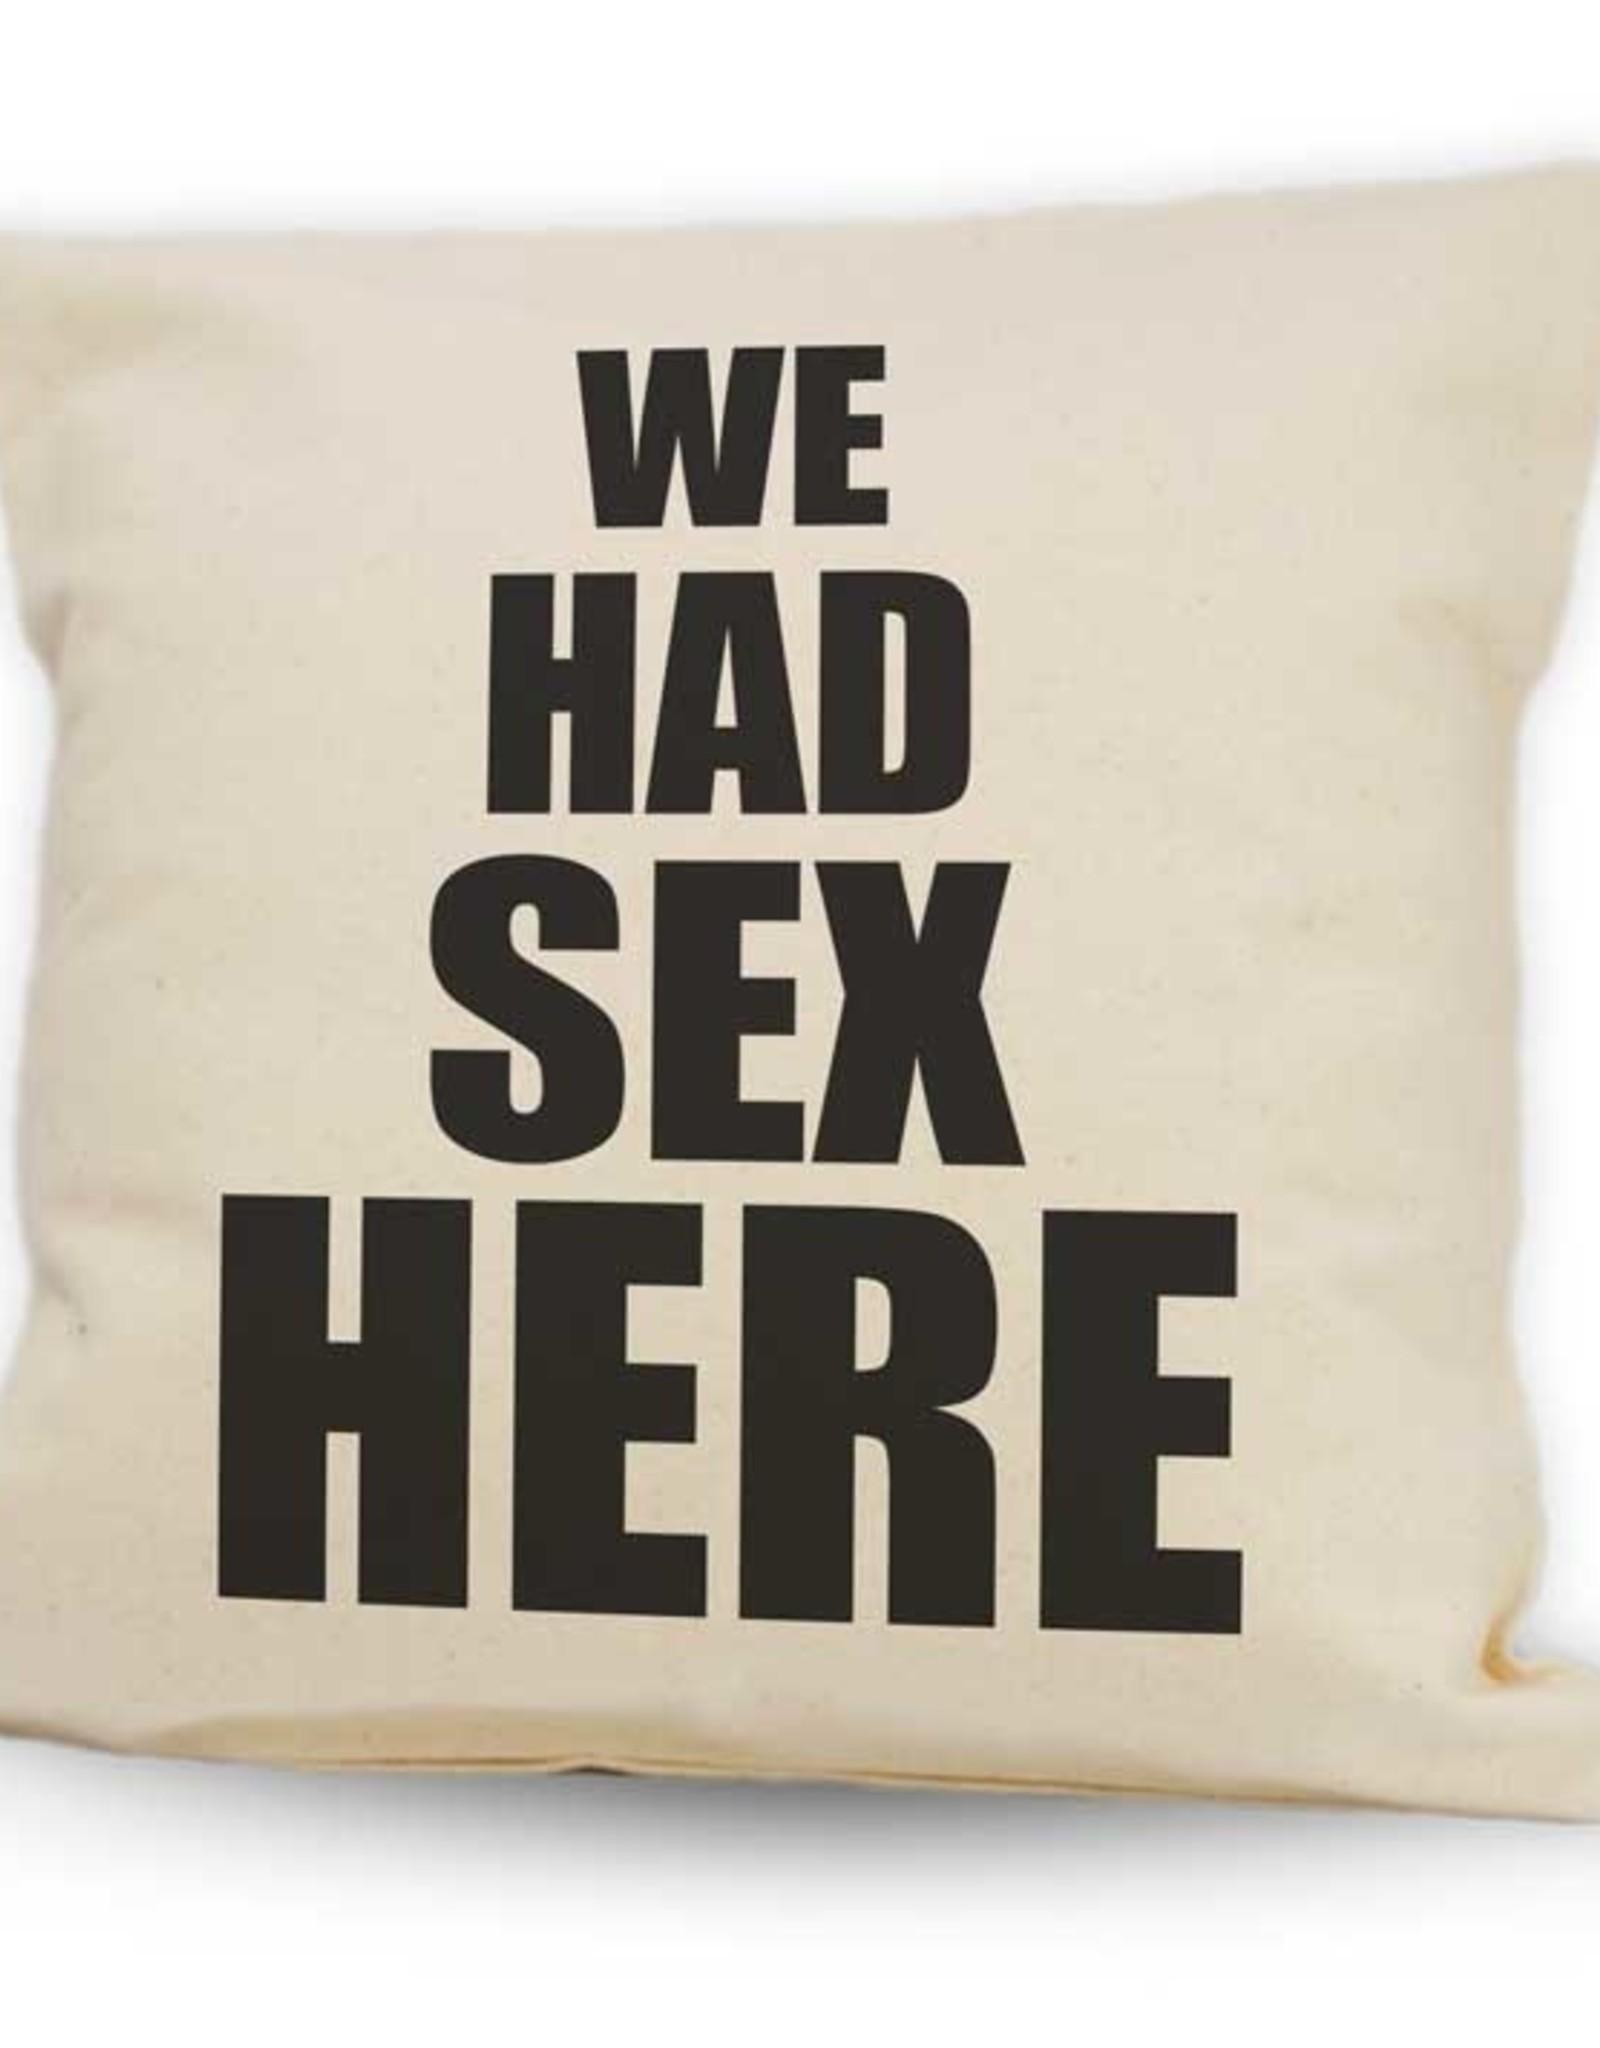 Cushions Pinetree Had Sex Here 12 x 12